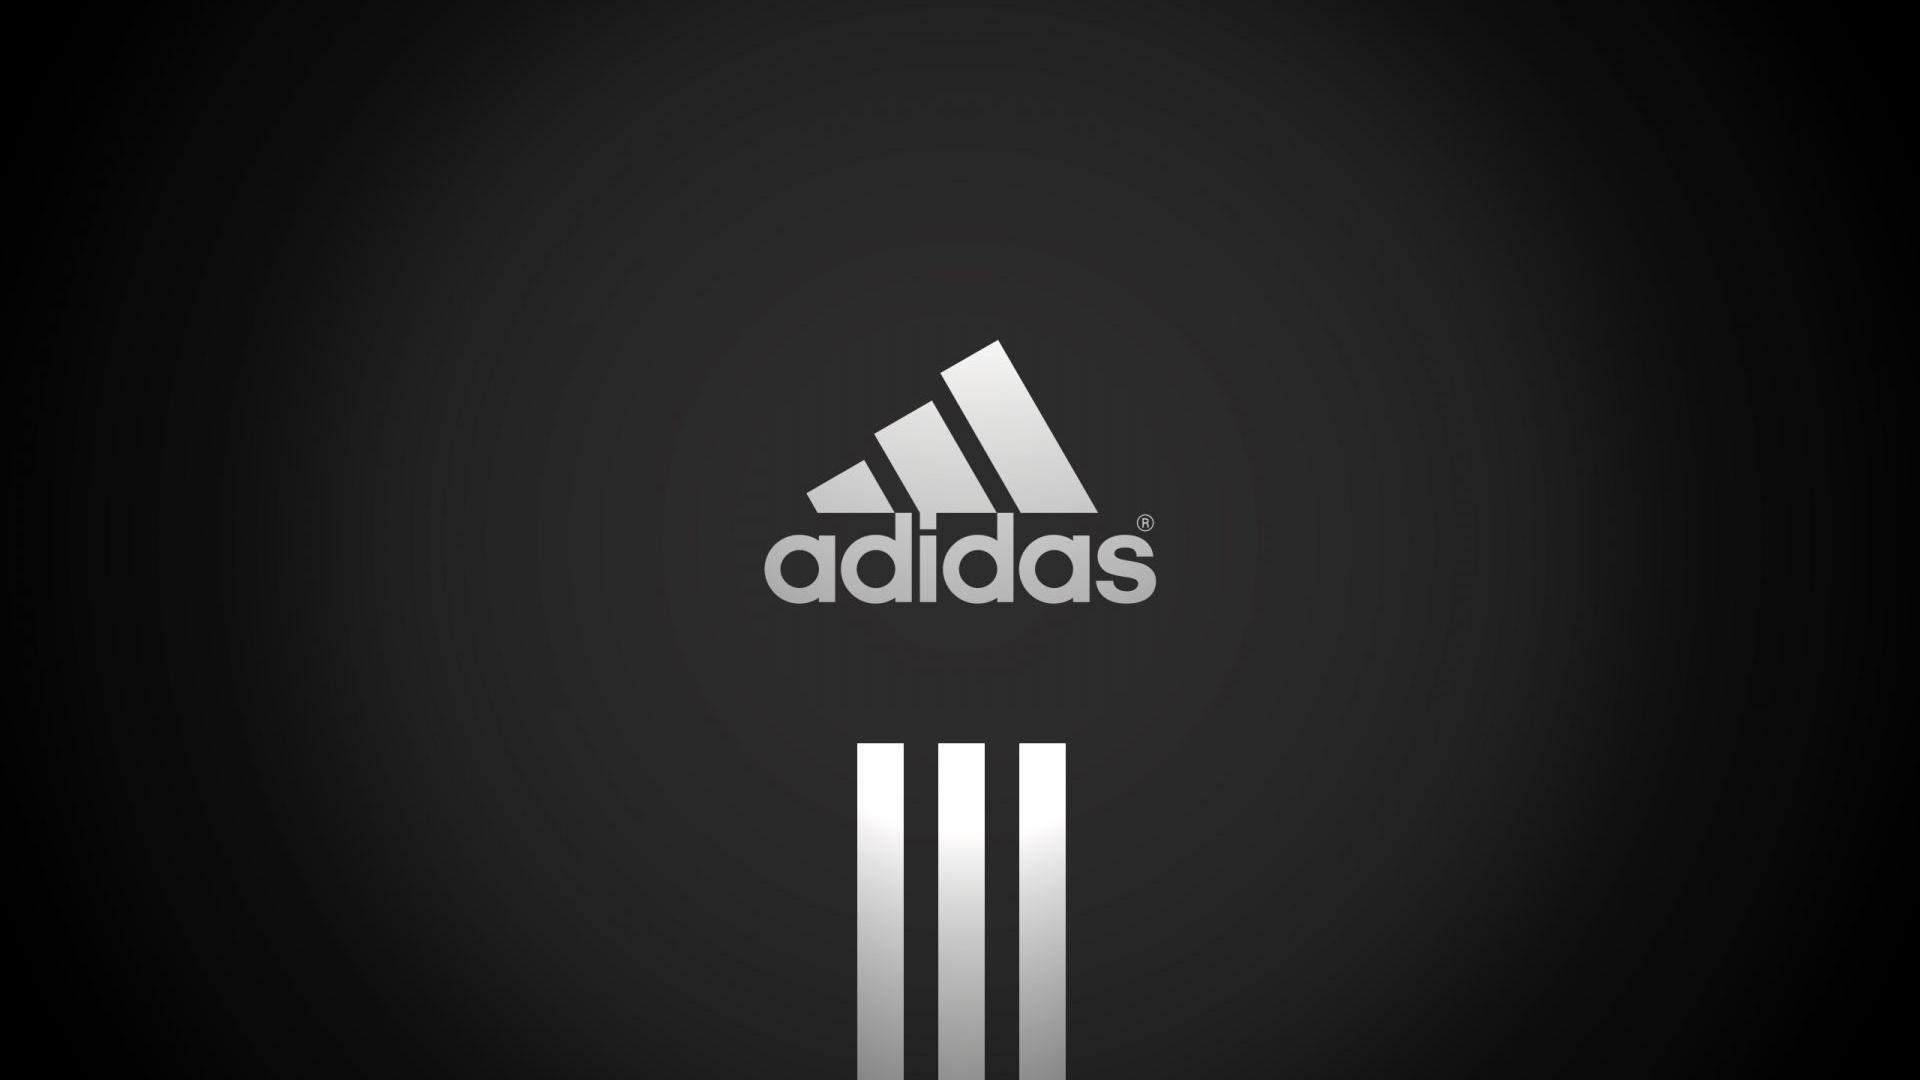 Adidas-Black-1080p-HD-Logo-Desktop-wallpaper-wp3602240